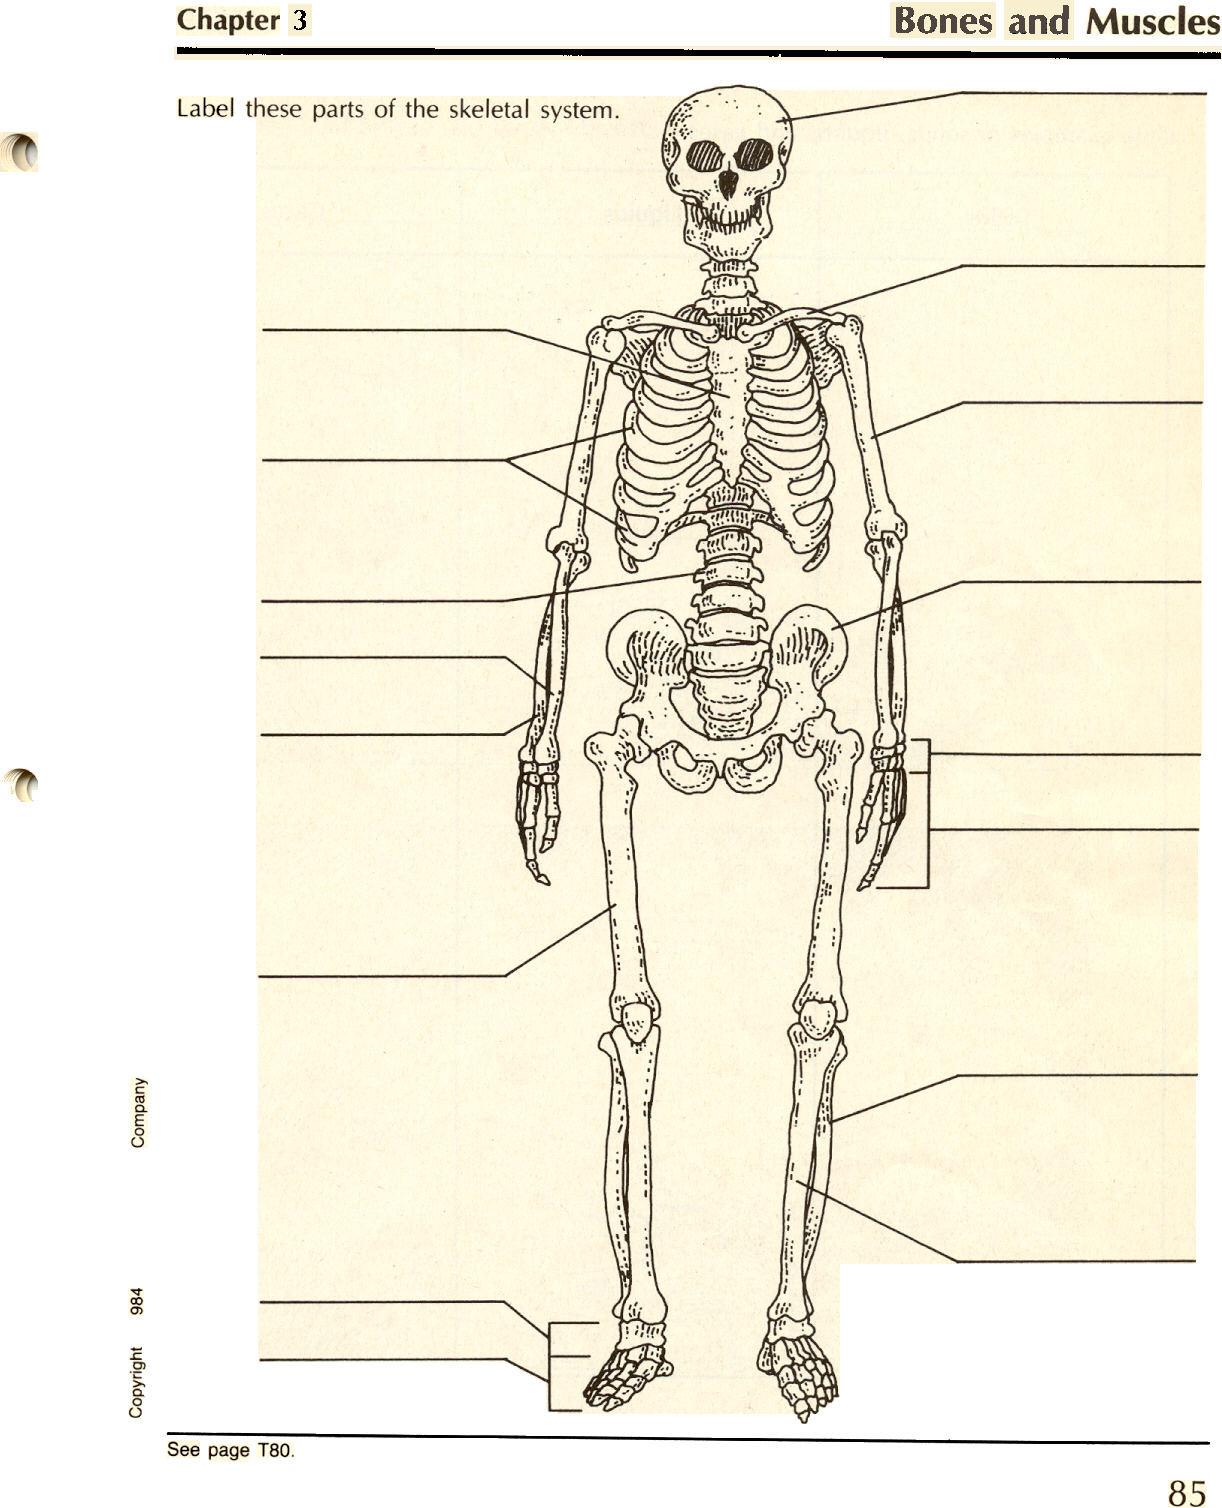 The Skeletal System Worksheet Blank Skeletal System Diagram Human Body Anatomy